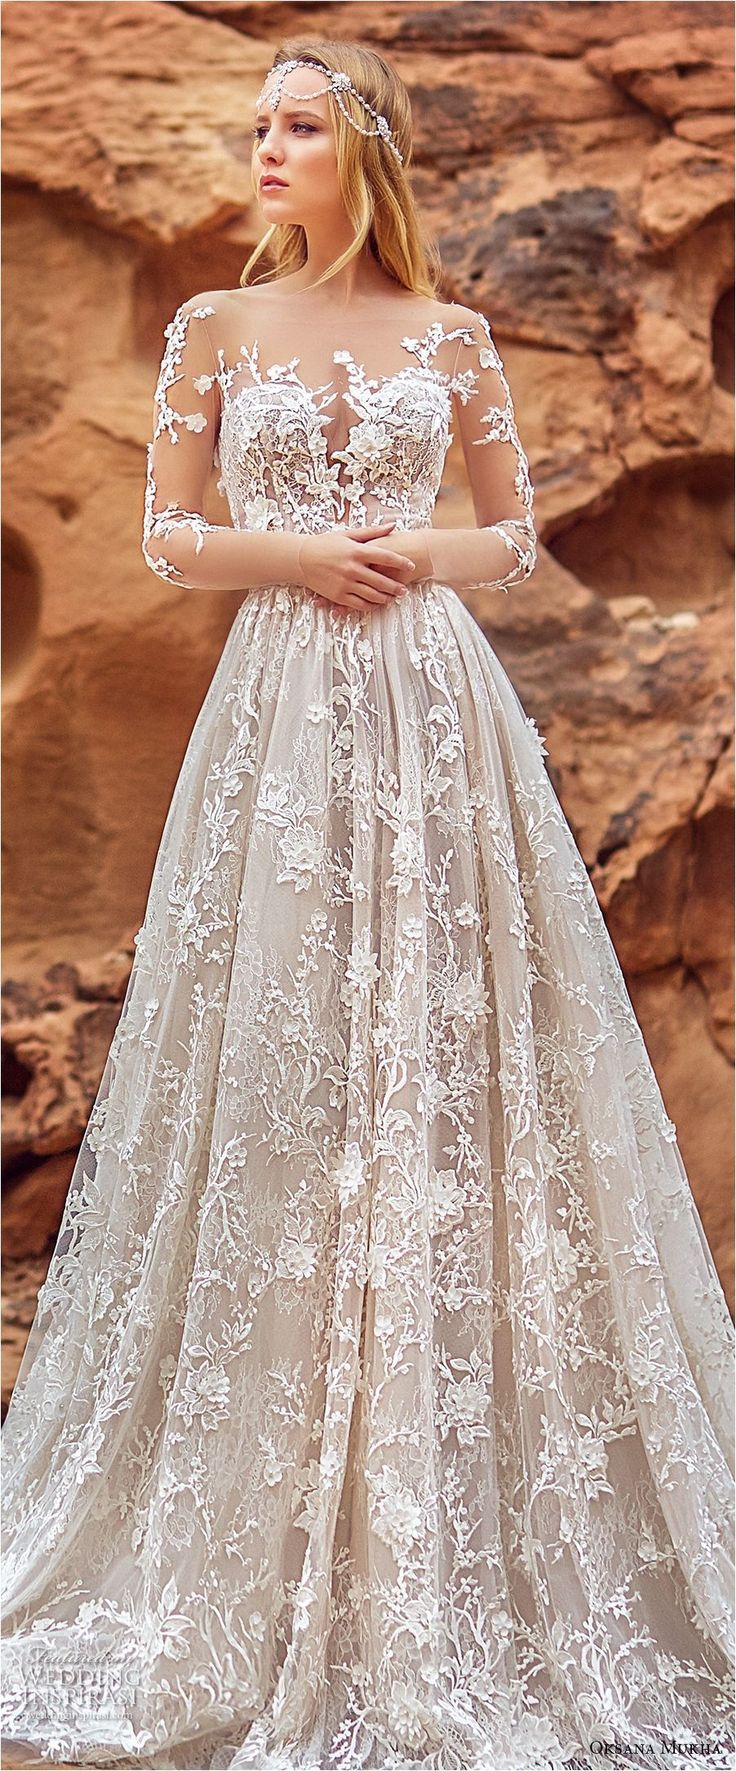 223 best wedding dresses images on Pinterest | Bridal gowns ...